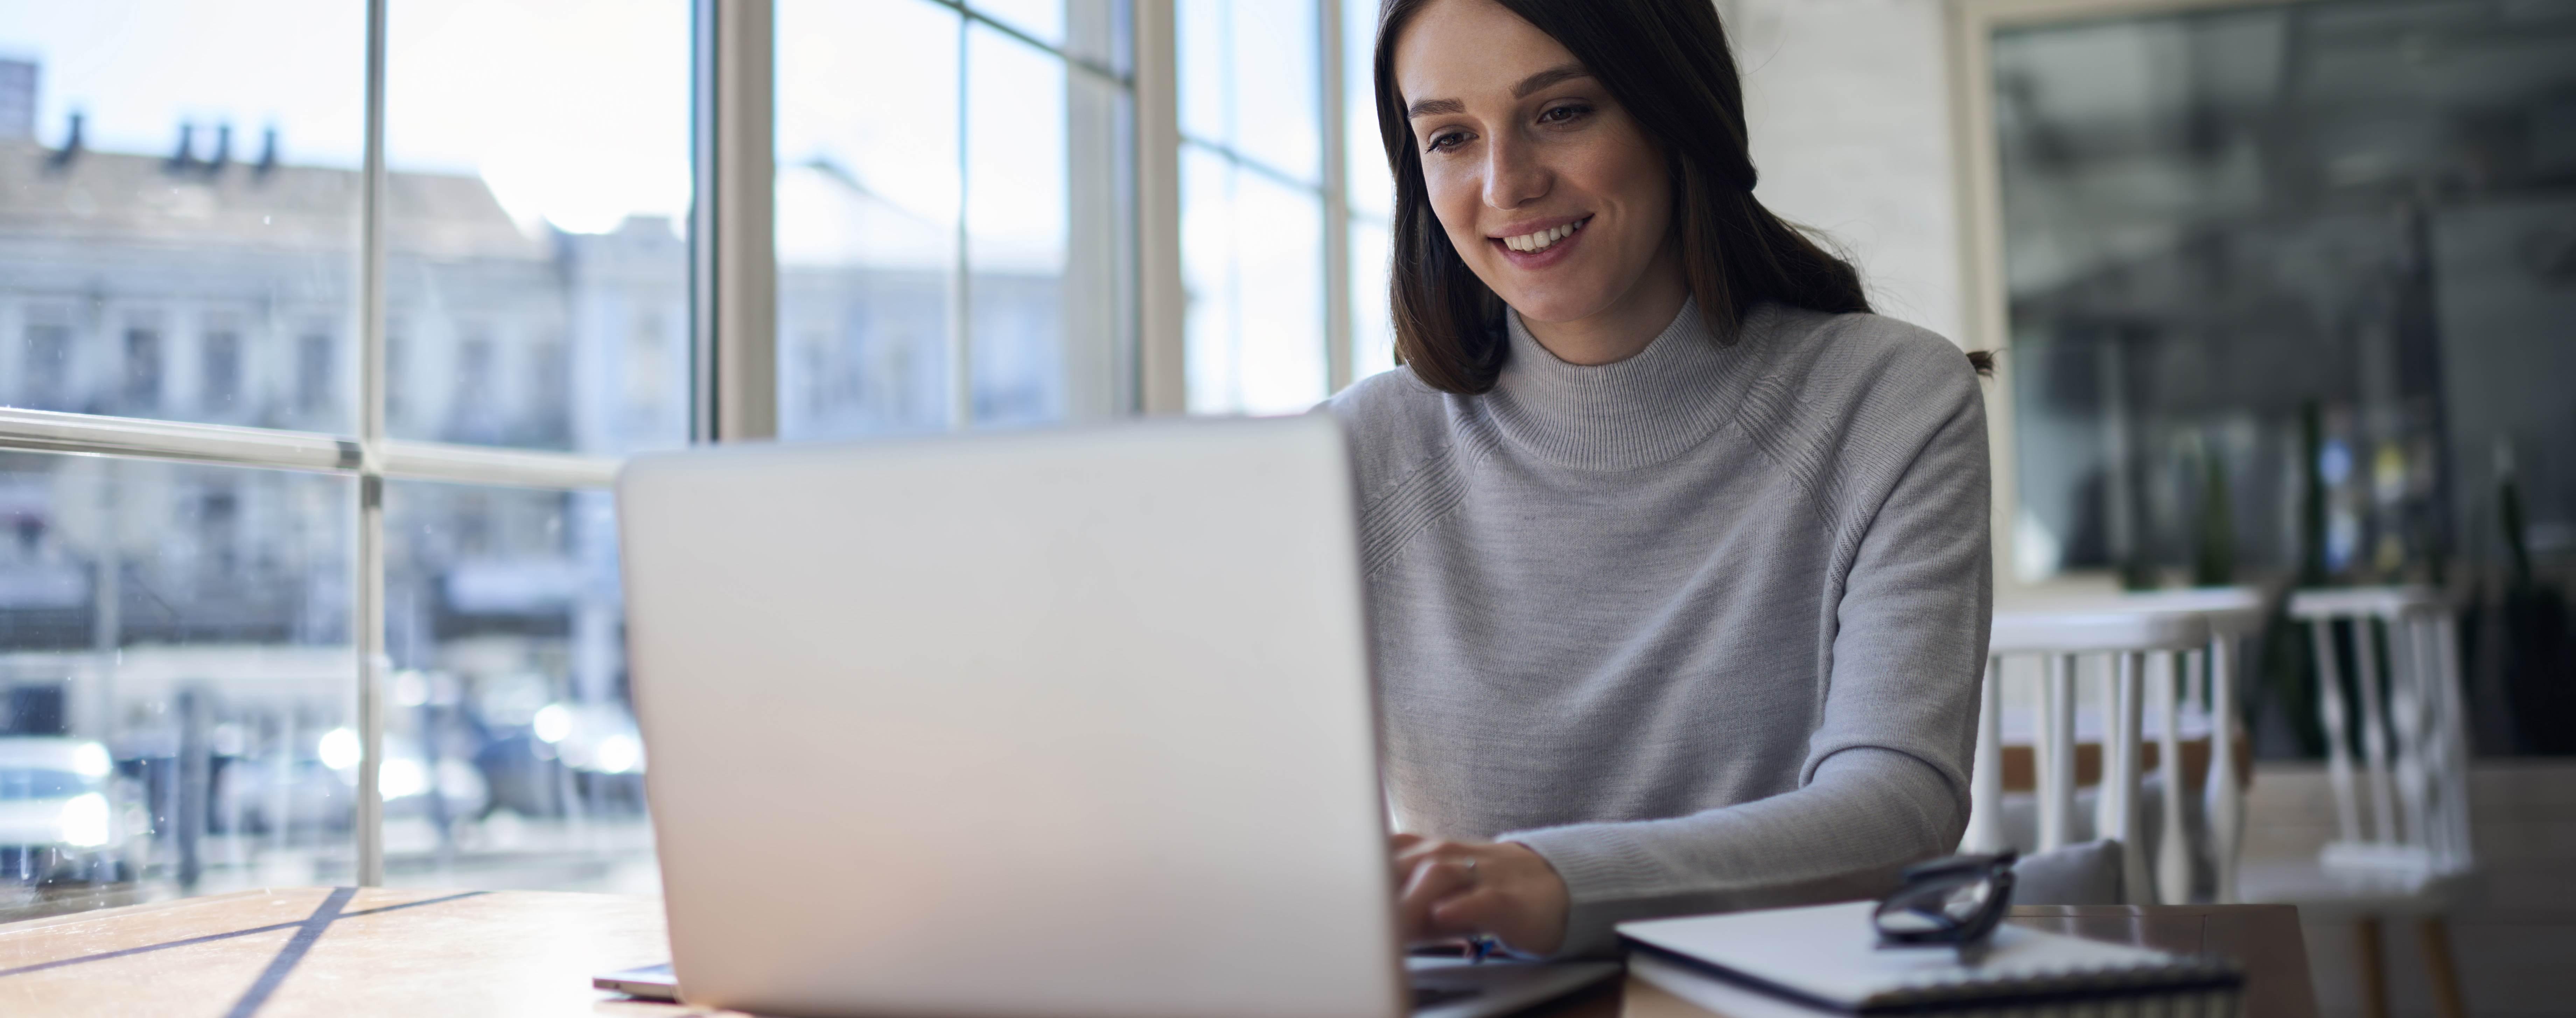 woman looking at webinar on laptop